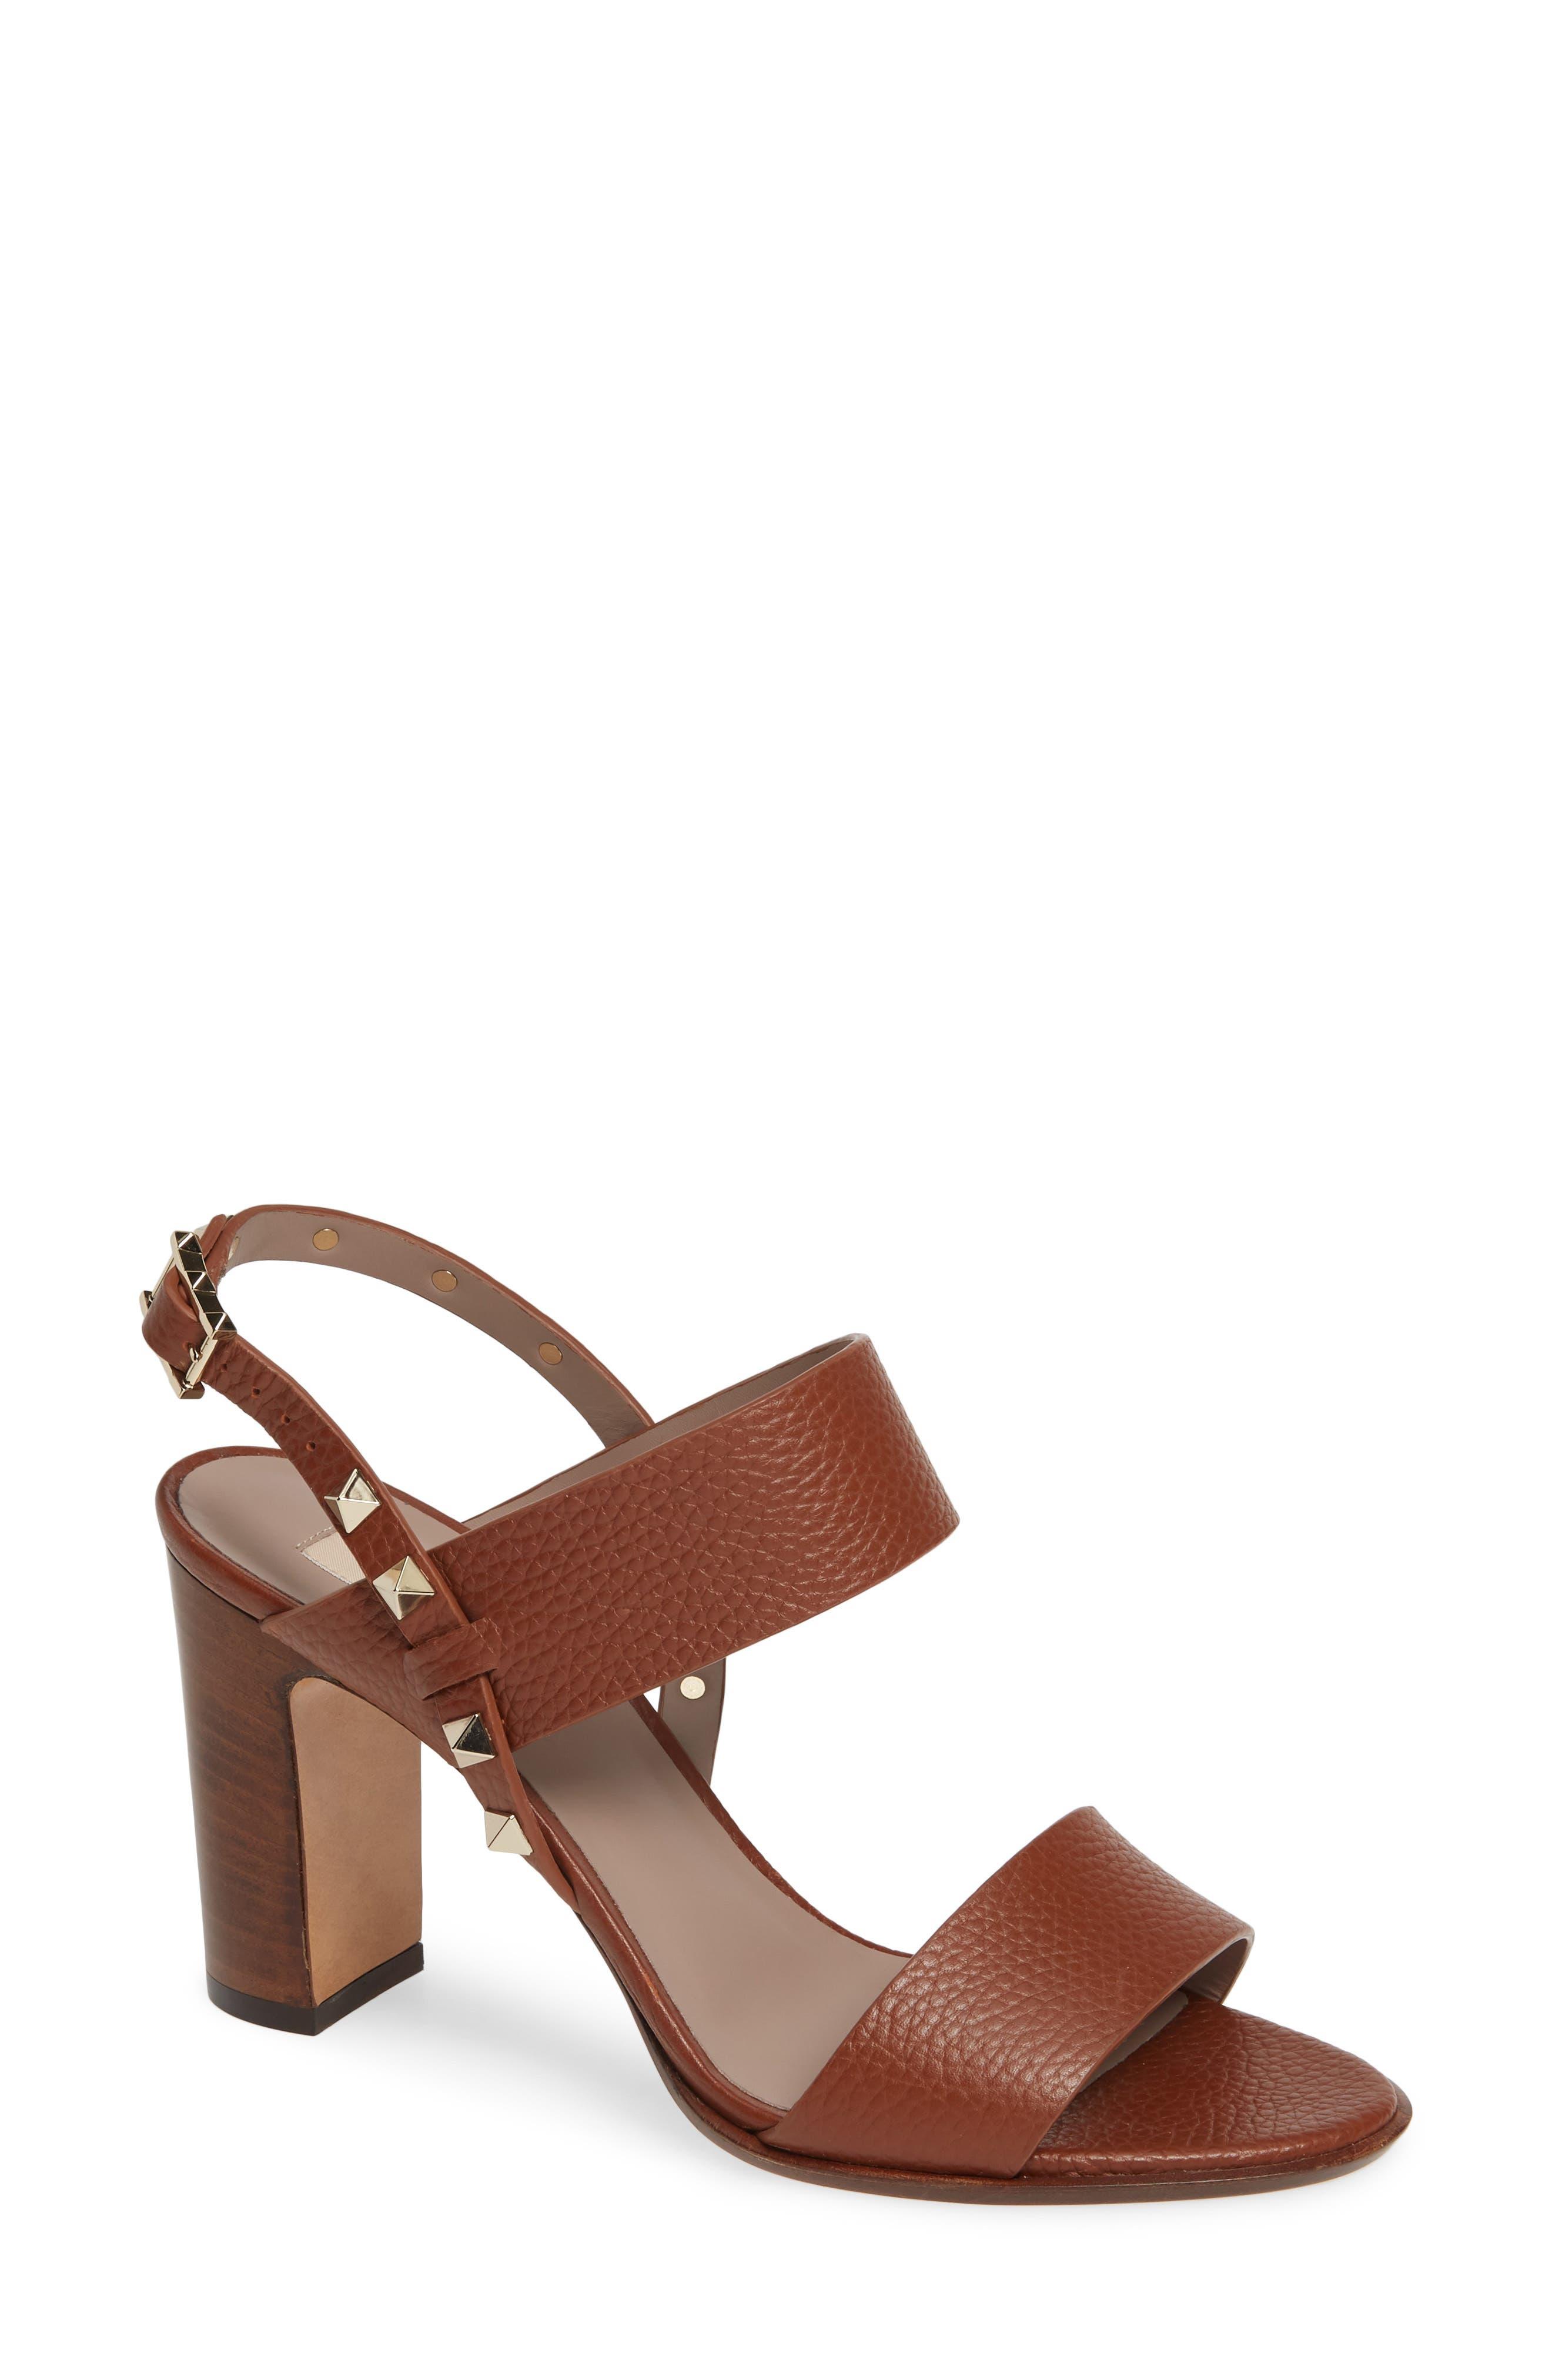 VALENTINO GARAVANI Rockstud Double Block Sandal (Women)